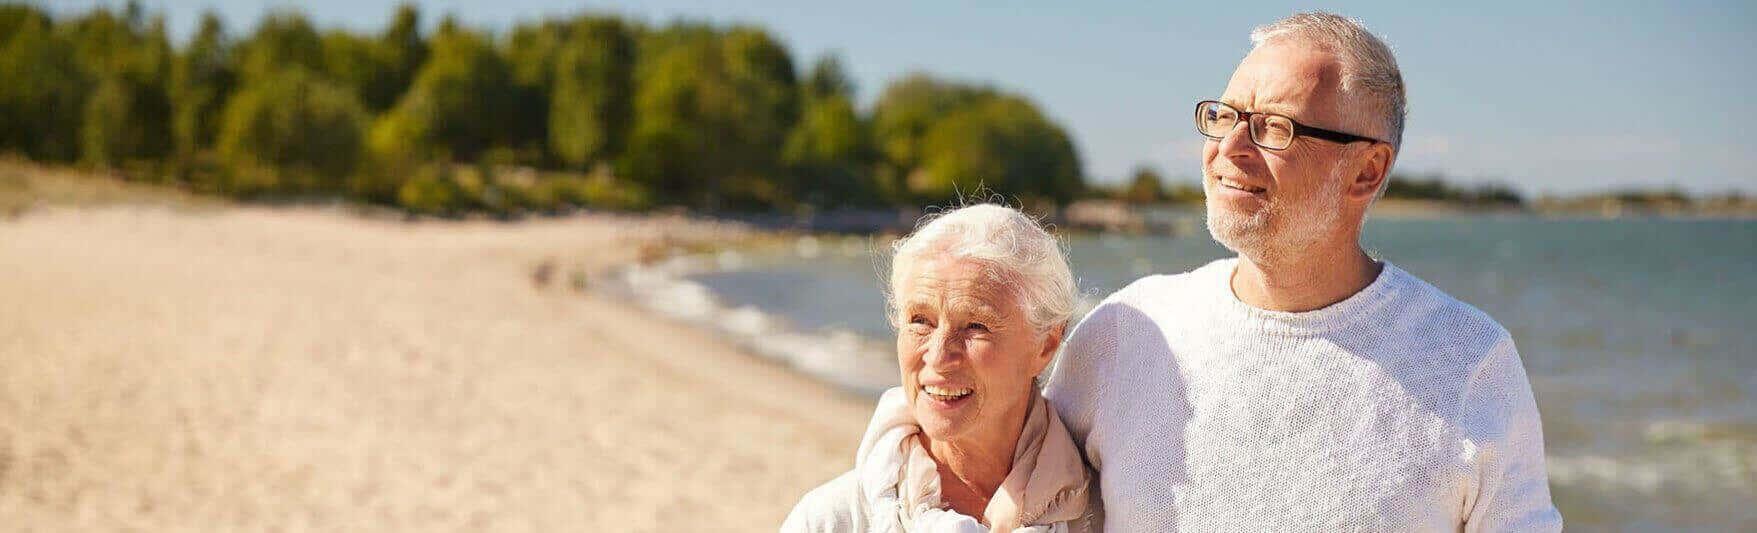 old couple on beach